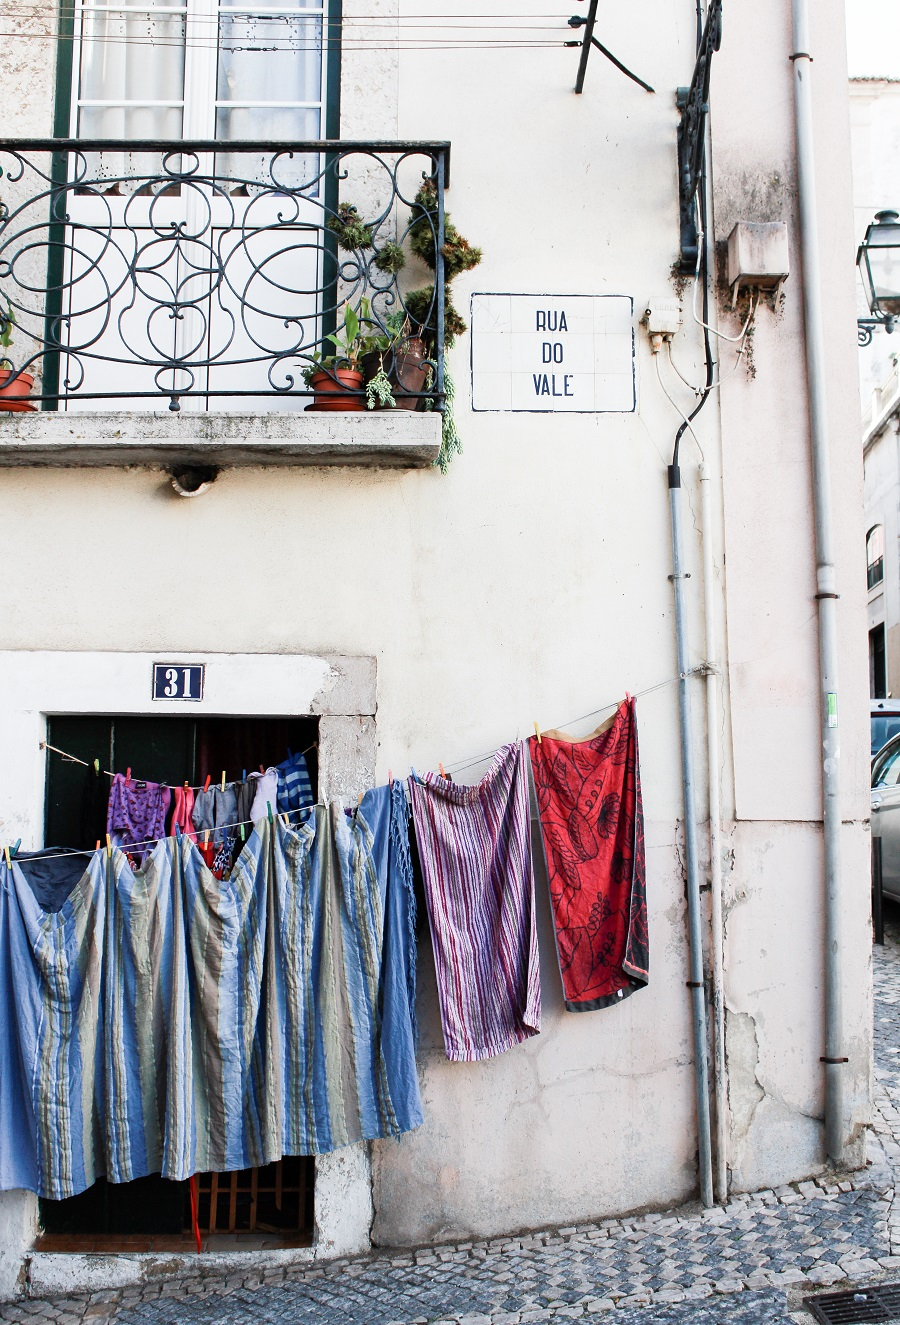 10_15_Lisboa_Viajar_Inspira-7.jpg